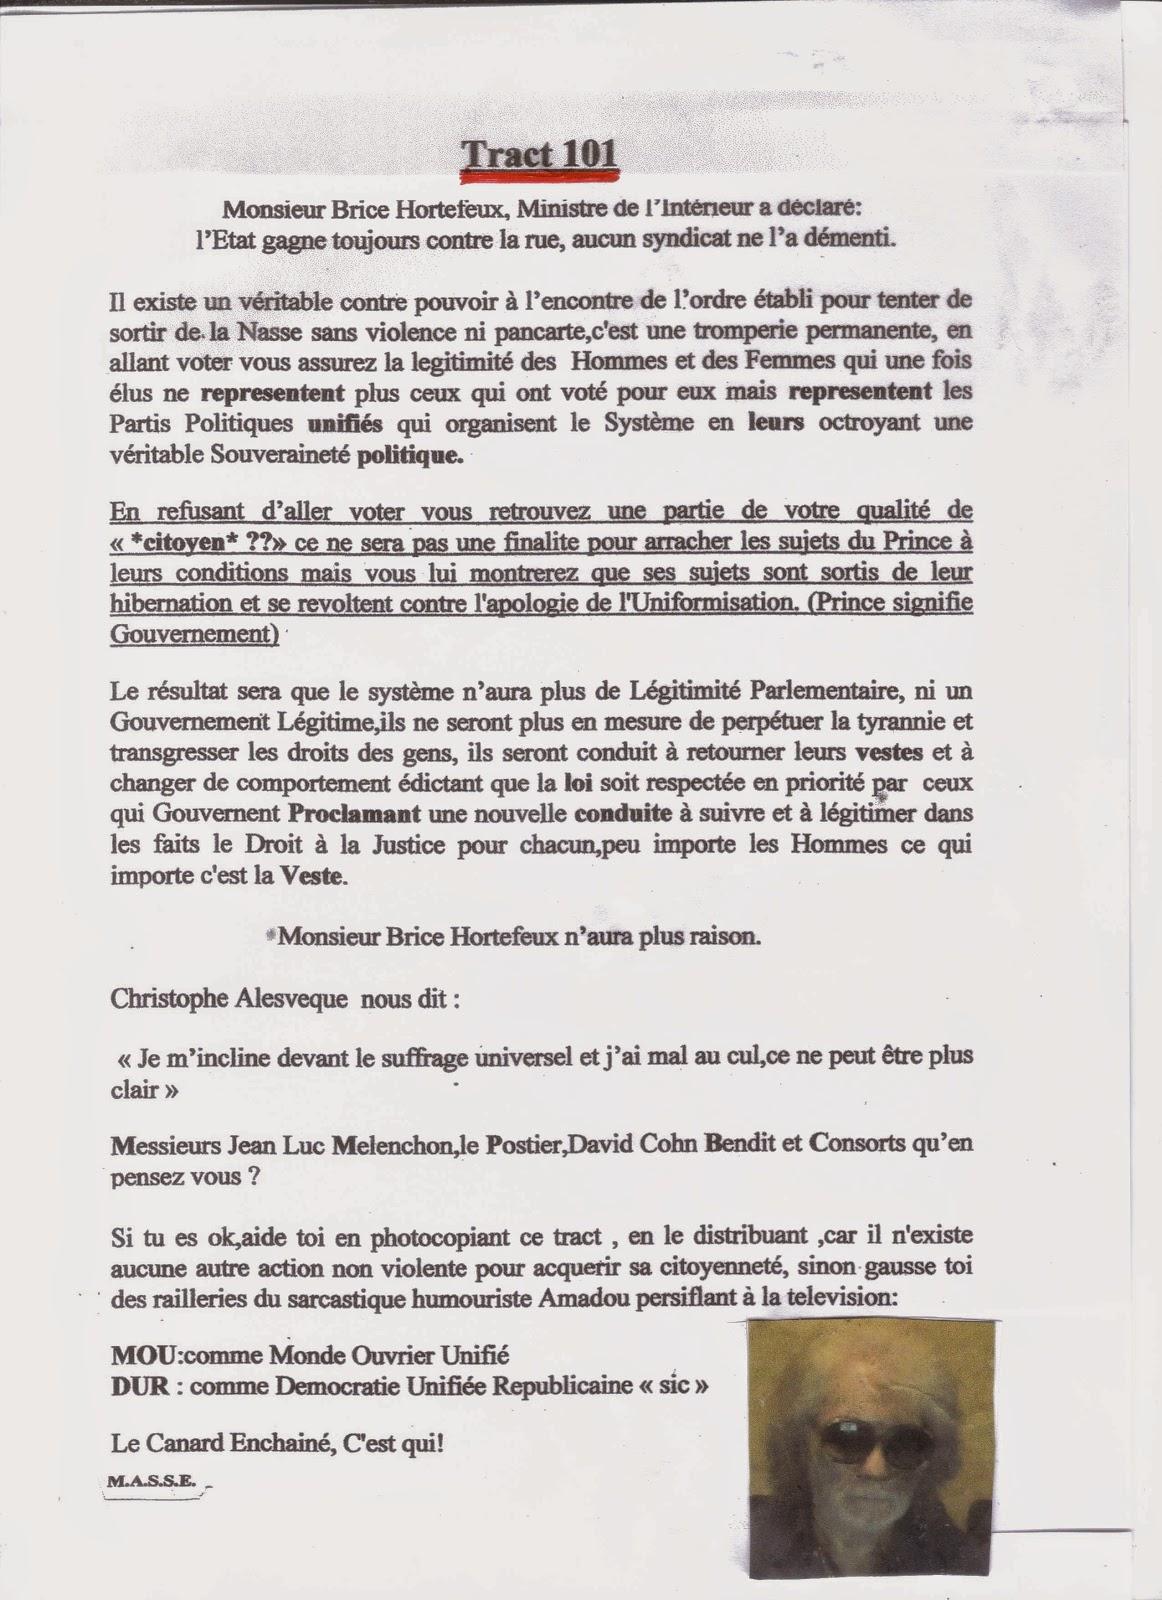 affaire marti raymond    1  systeme et despotisme depass u00cb